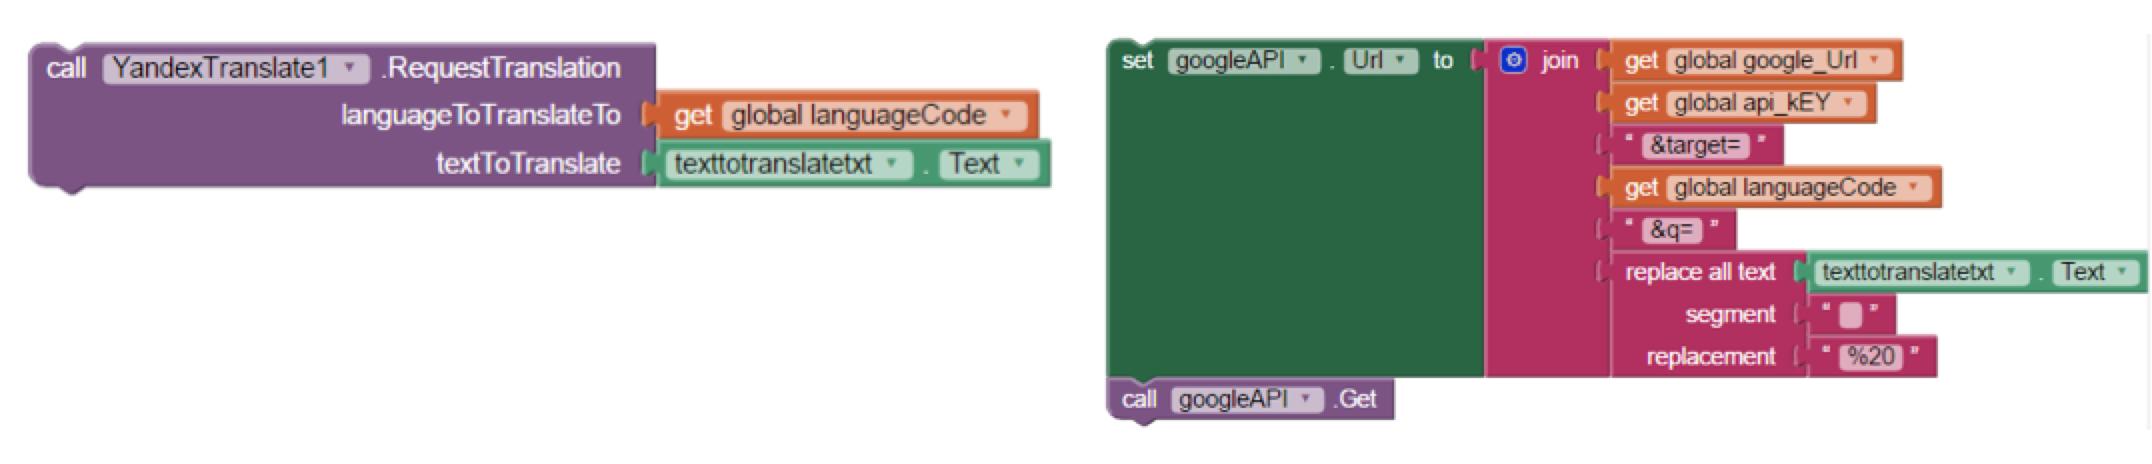 Google Translate API and App Inventor: An Alternative to Yandex